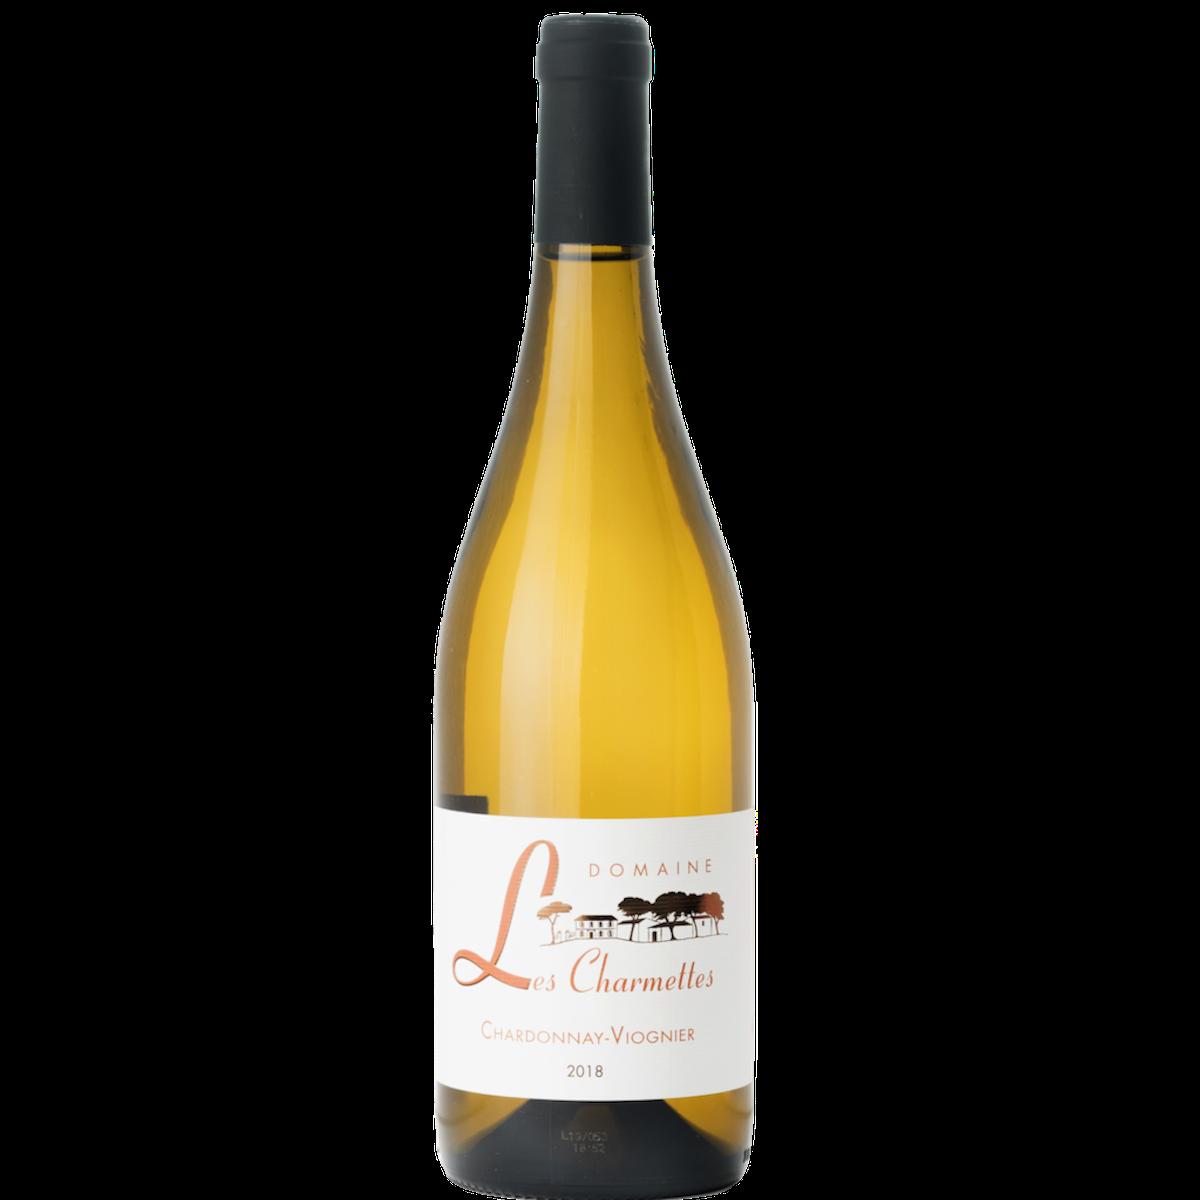 Chardonnay/Viognier, 2019